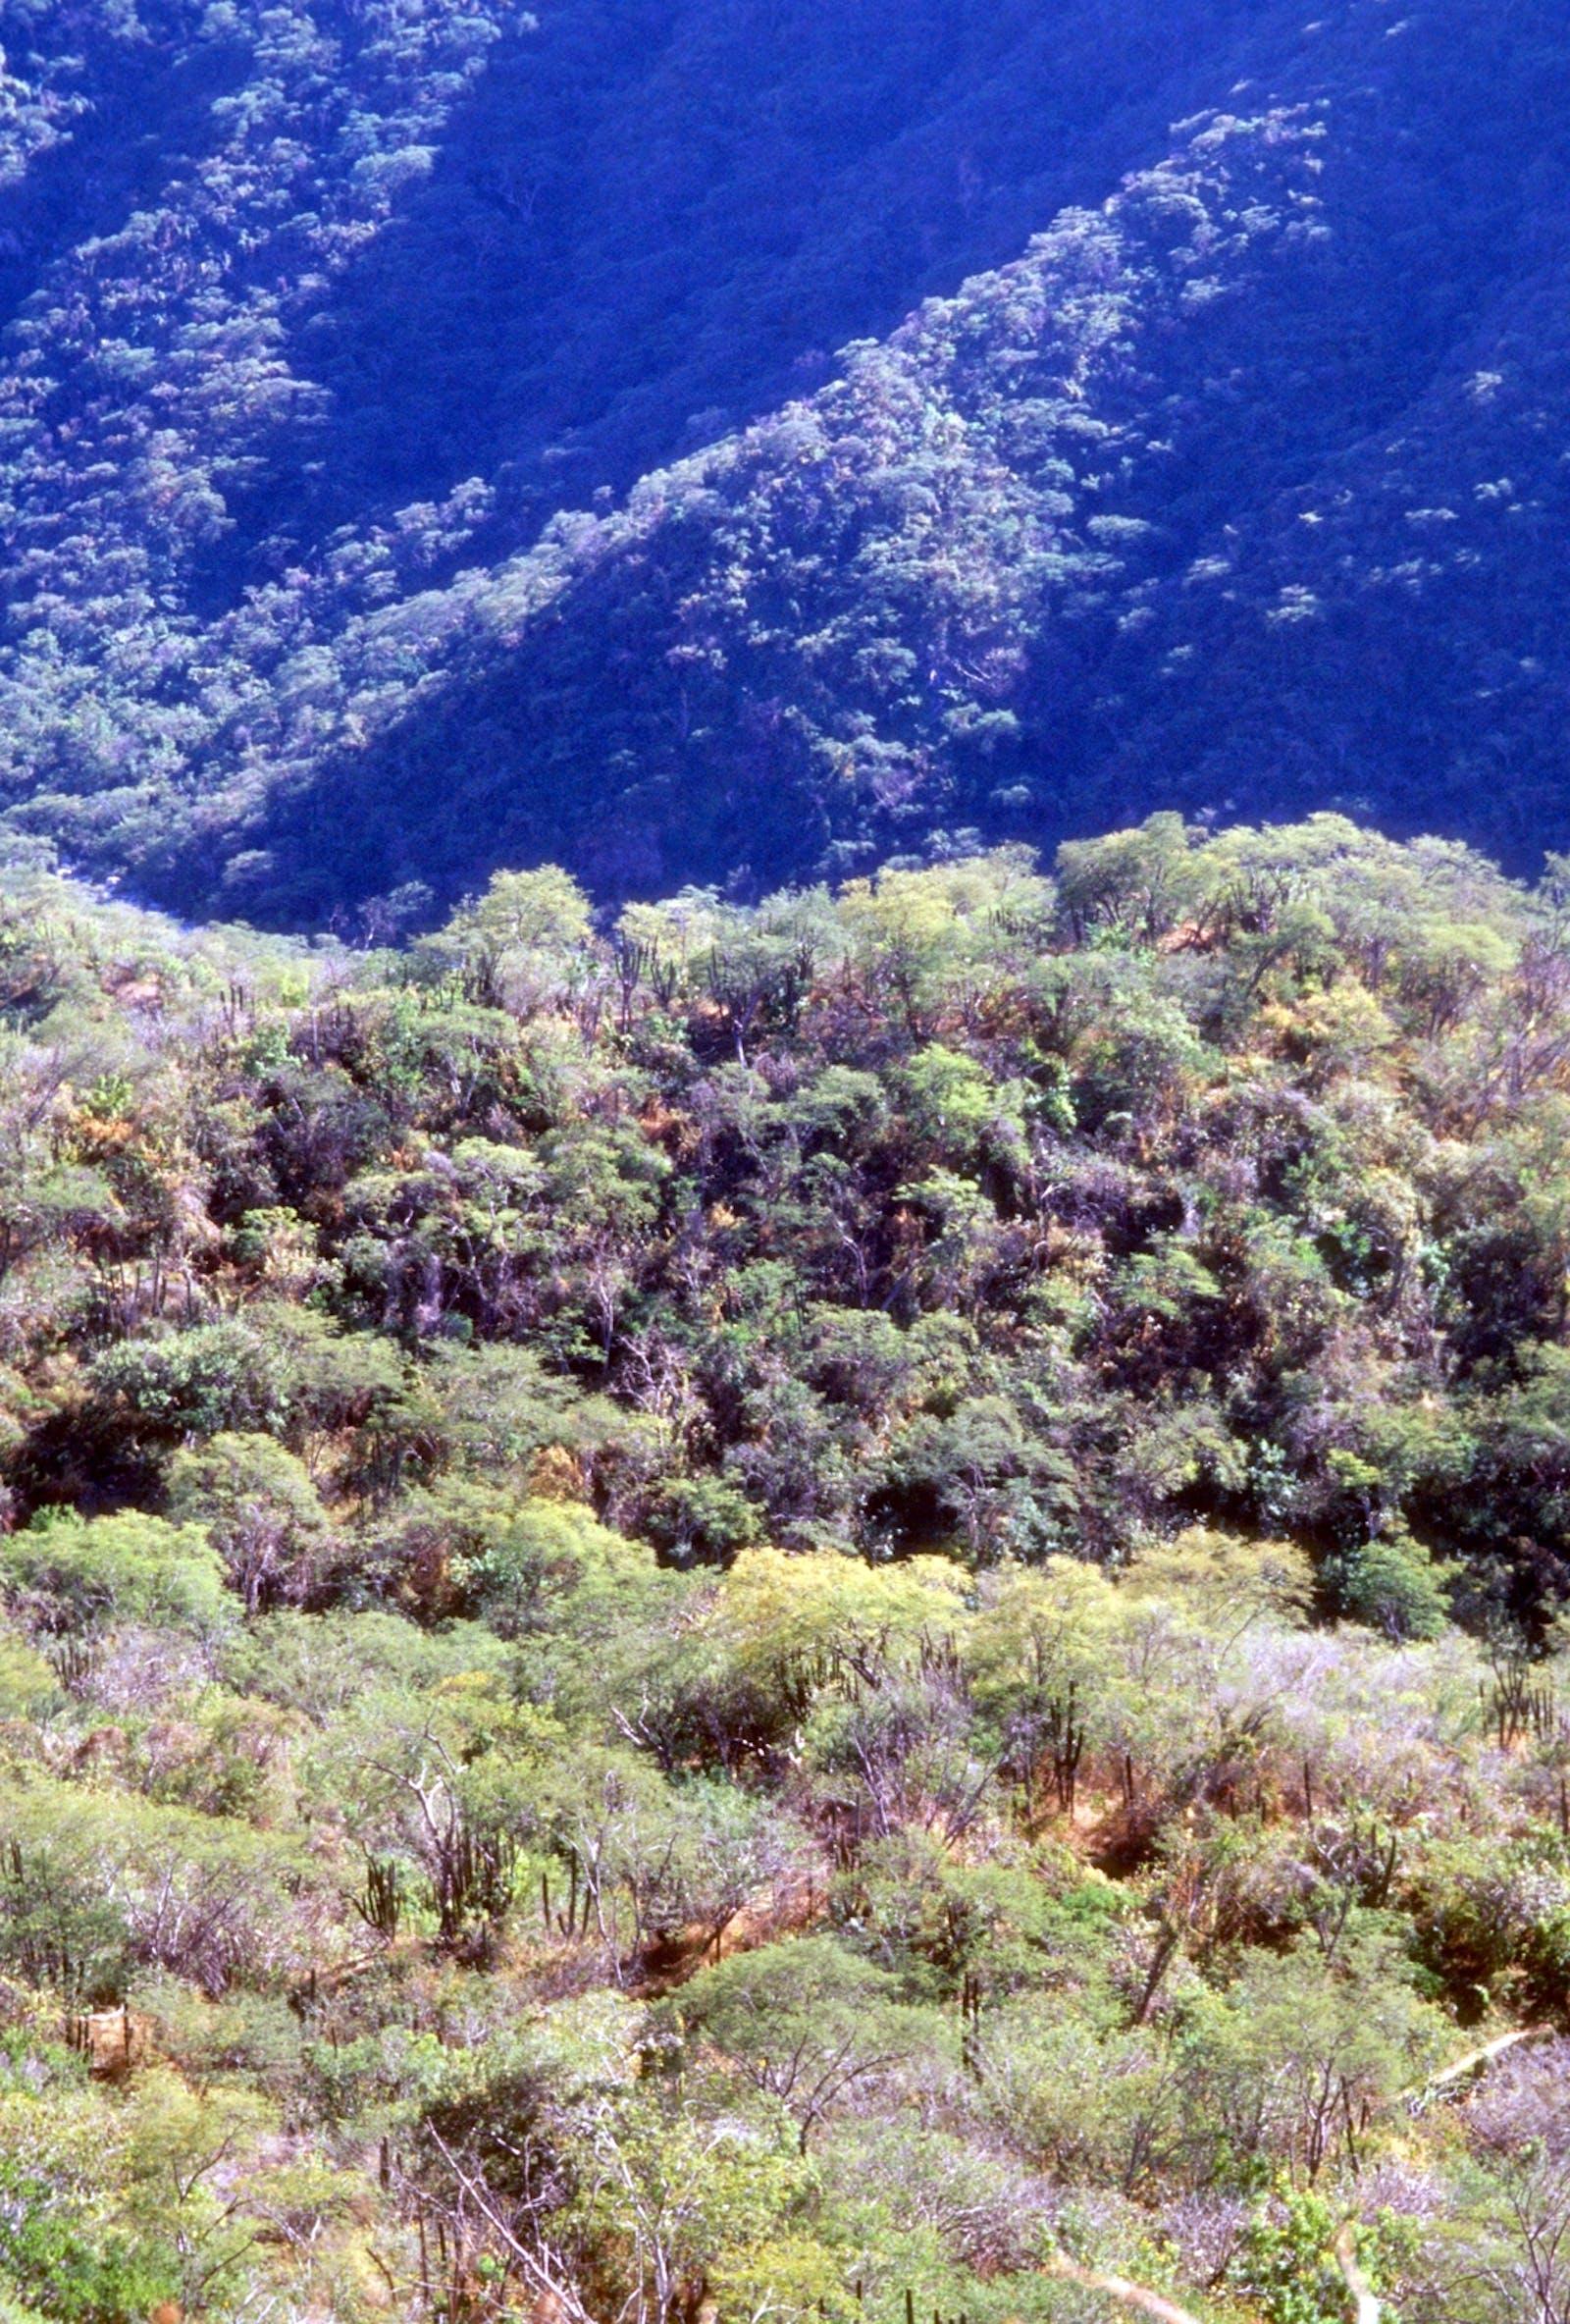 Sierra de la Laguna Dry Forests